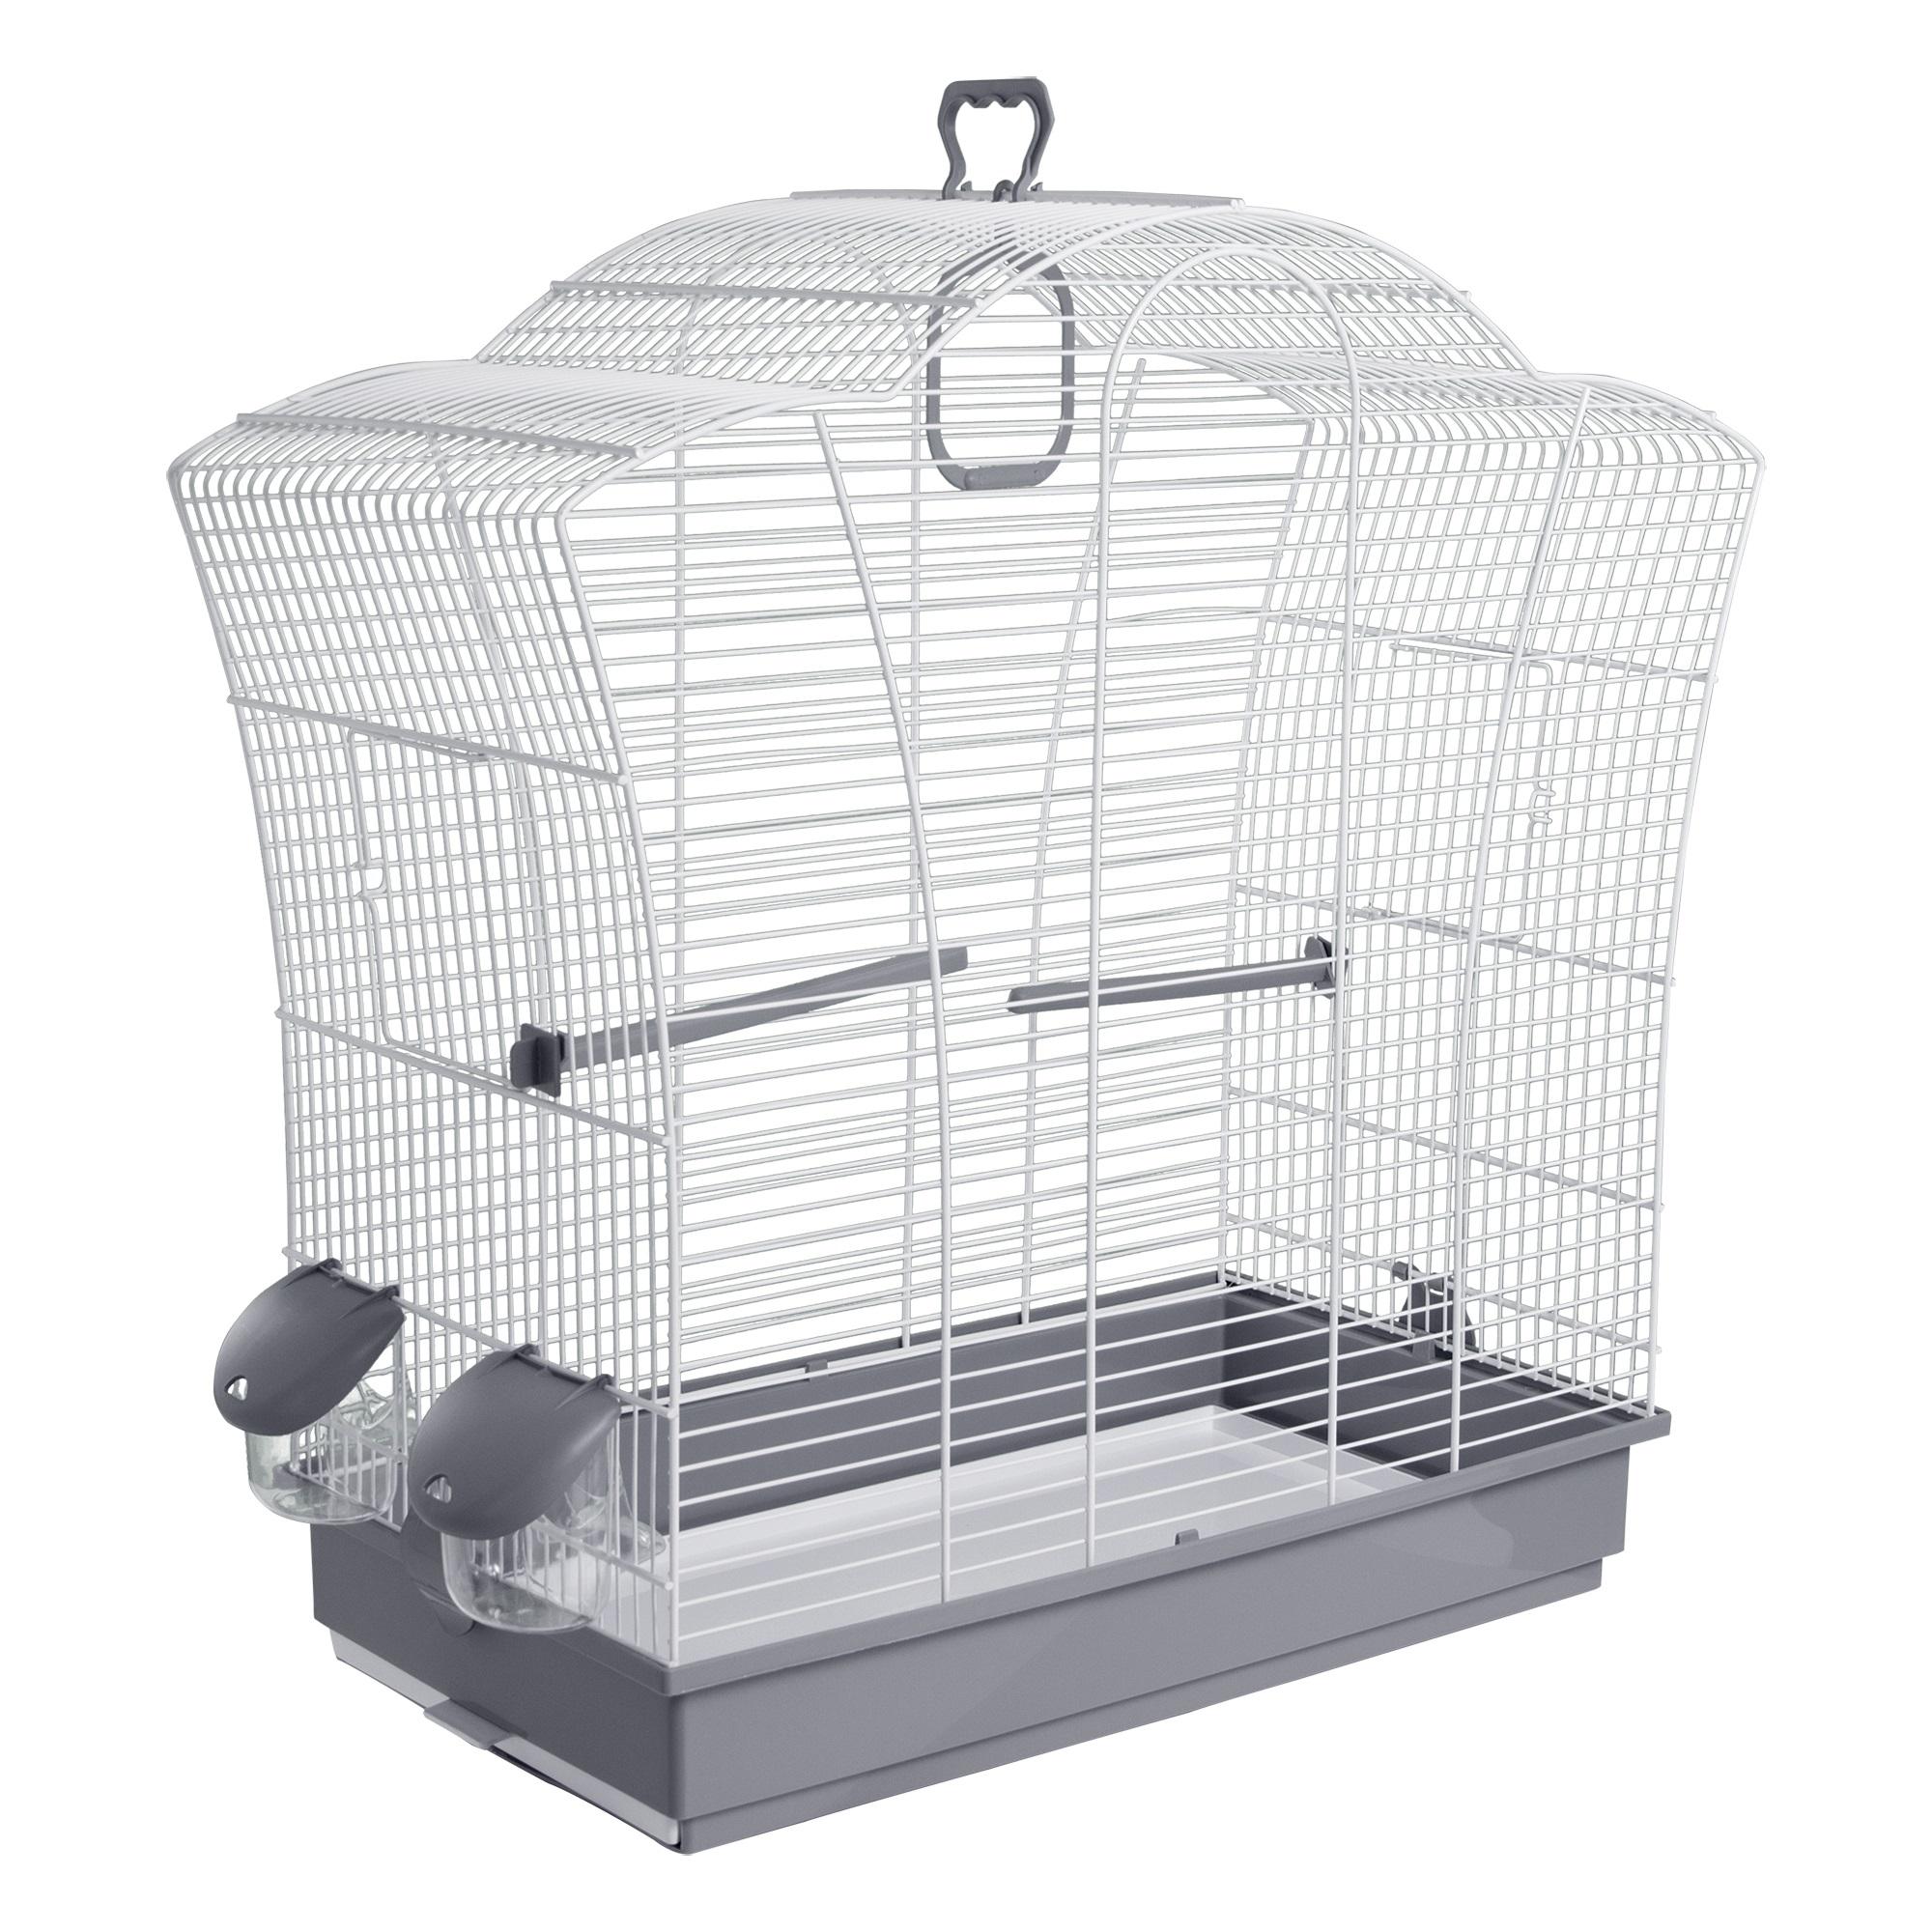 Клетка для птиц Voltrega (621) цвет белый/серый